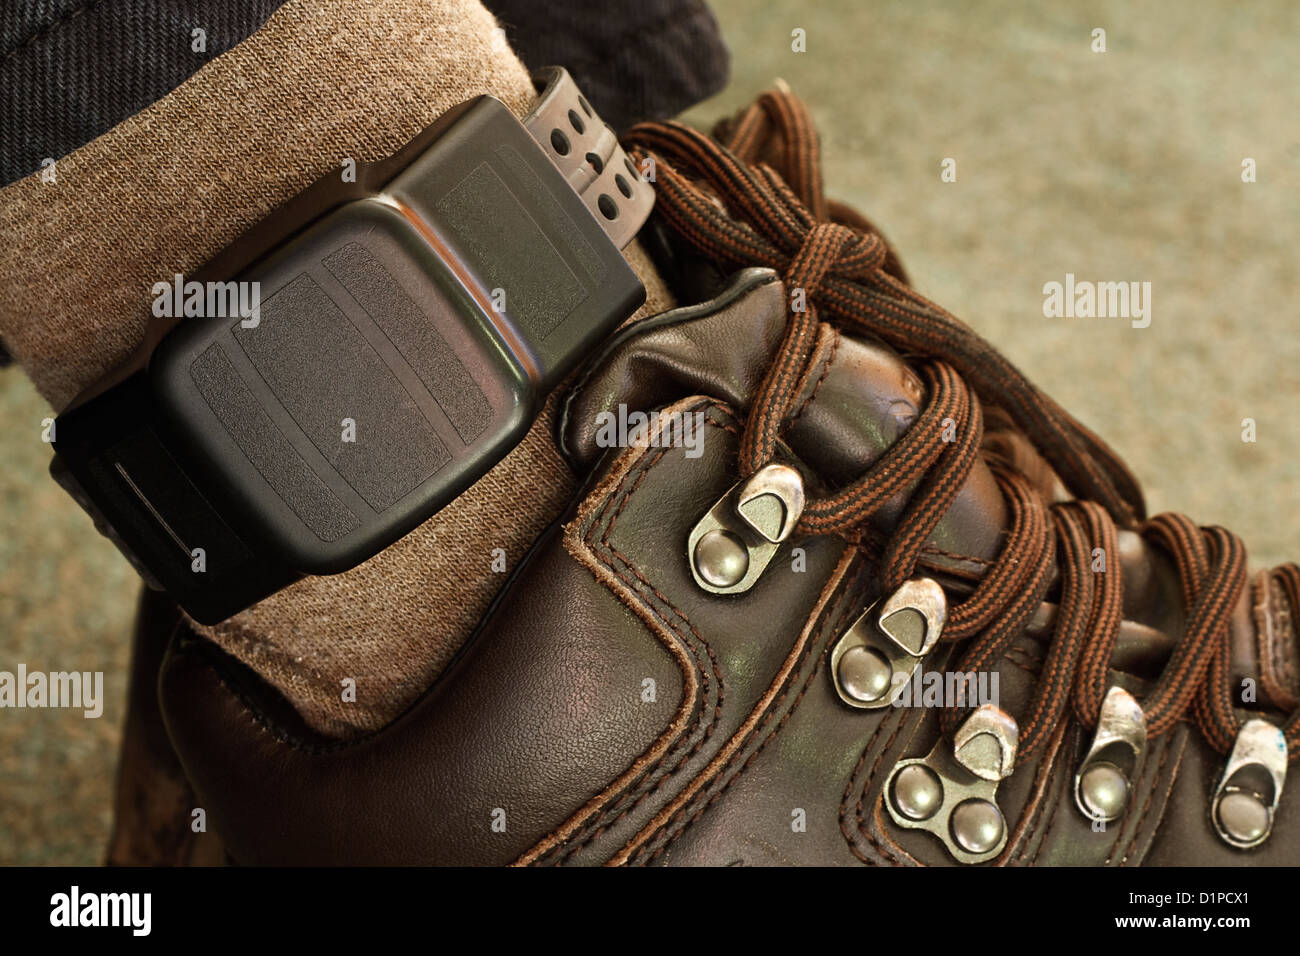 Etiqueta electrónica de seguridad en un penal etiquetados Foto de stock